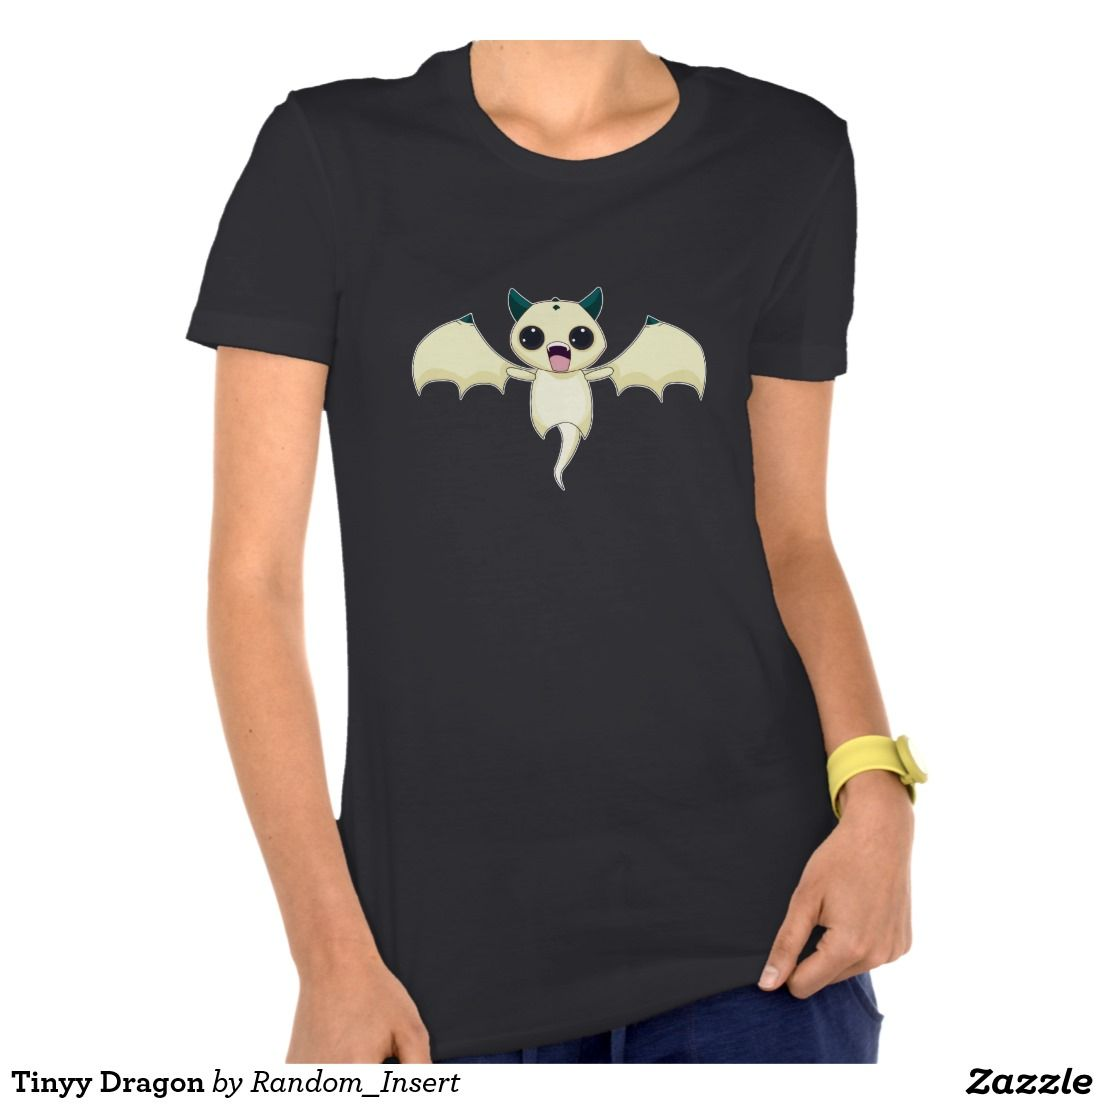 Tinyy Dragon T-shirts